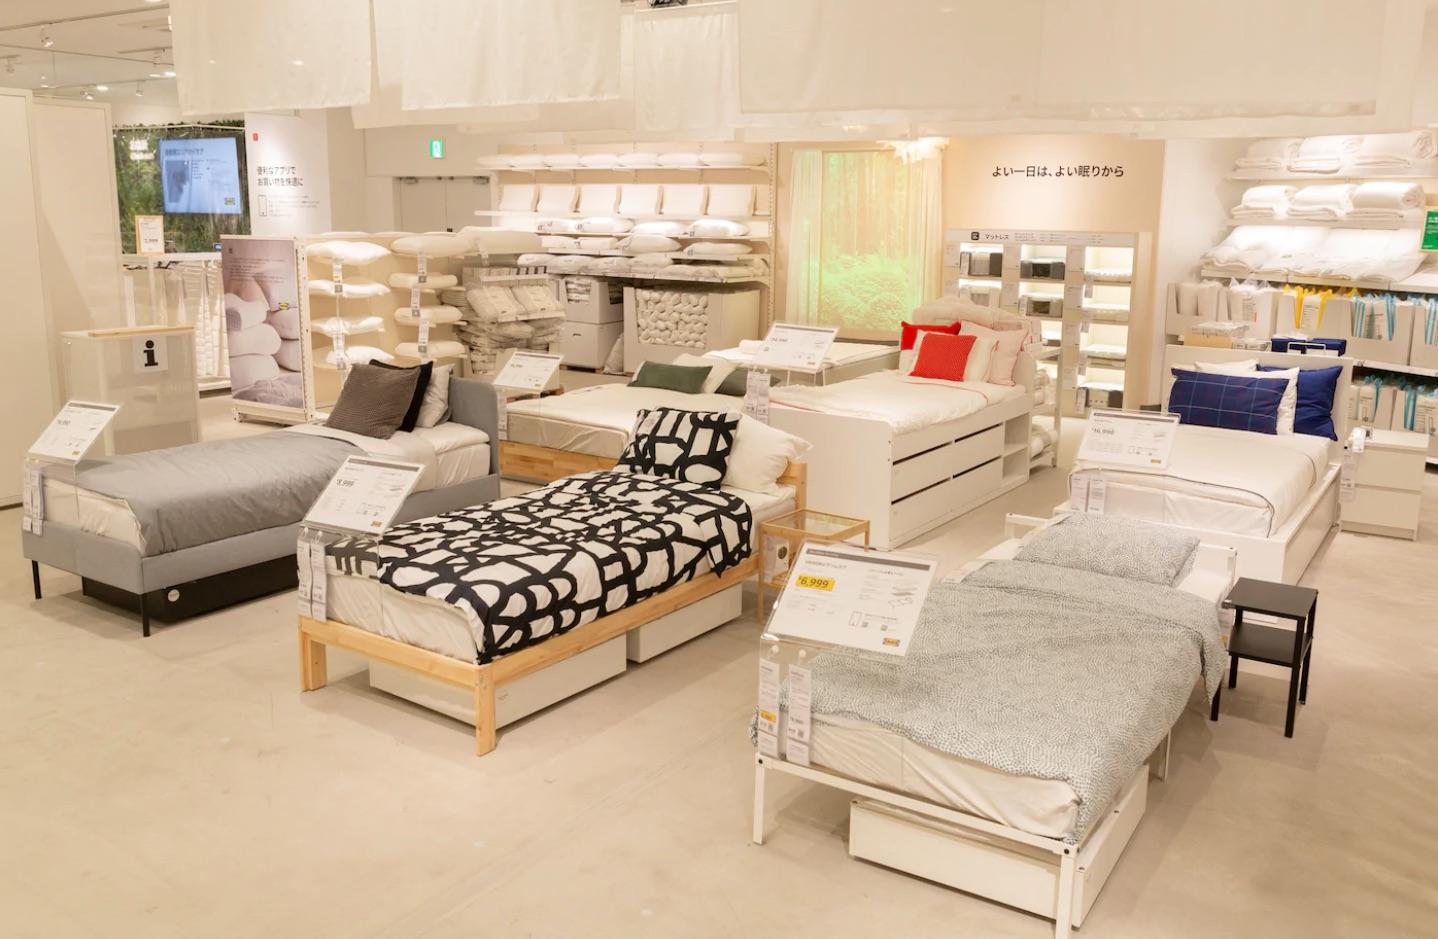 real estate japan ikea harajuku sleep furniture home goods - Blog